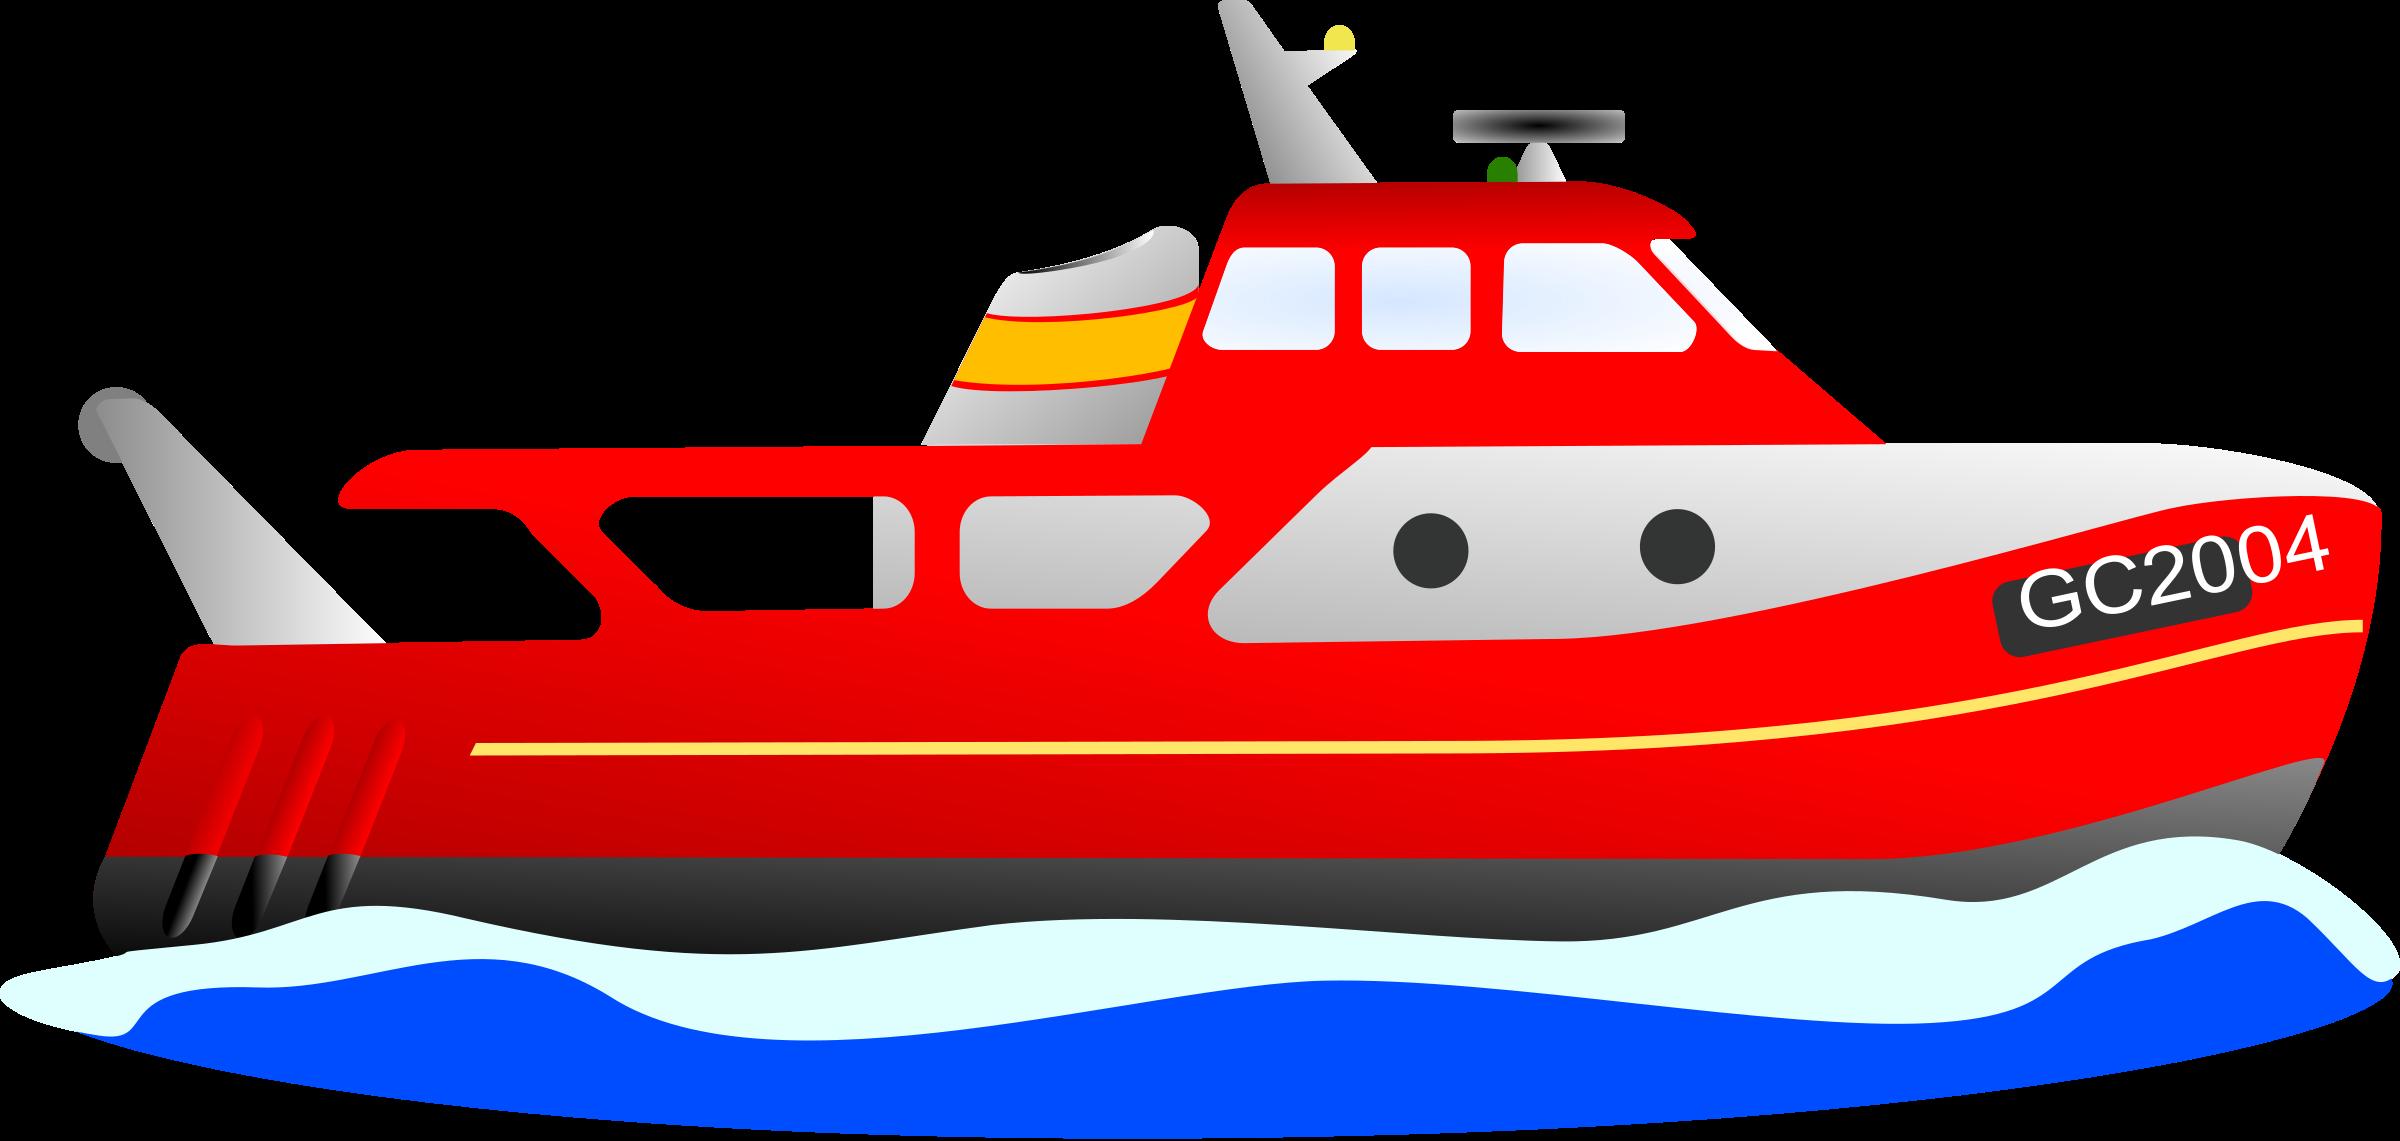 Trawler big image png. Navy clipart navy boat